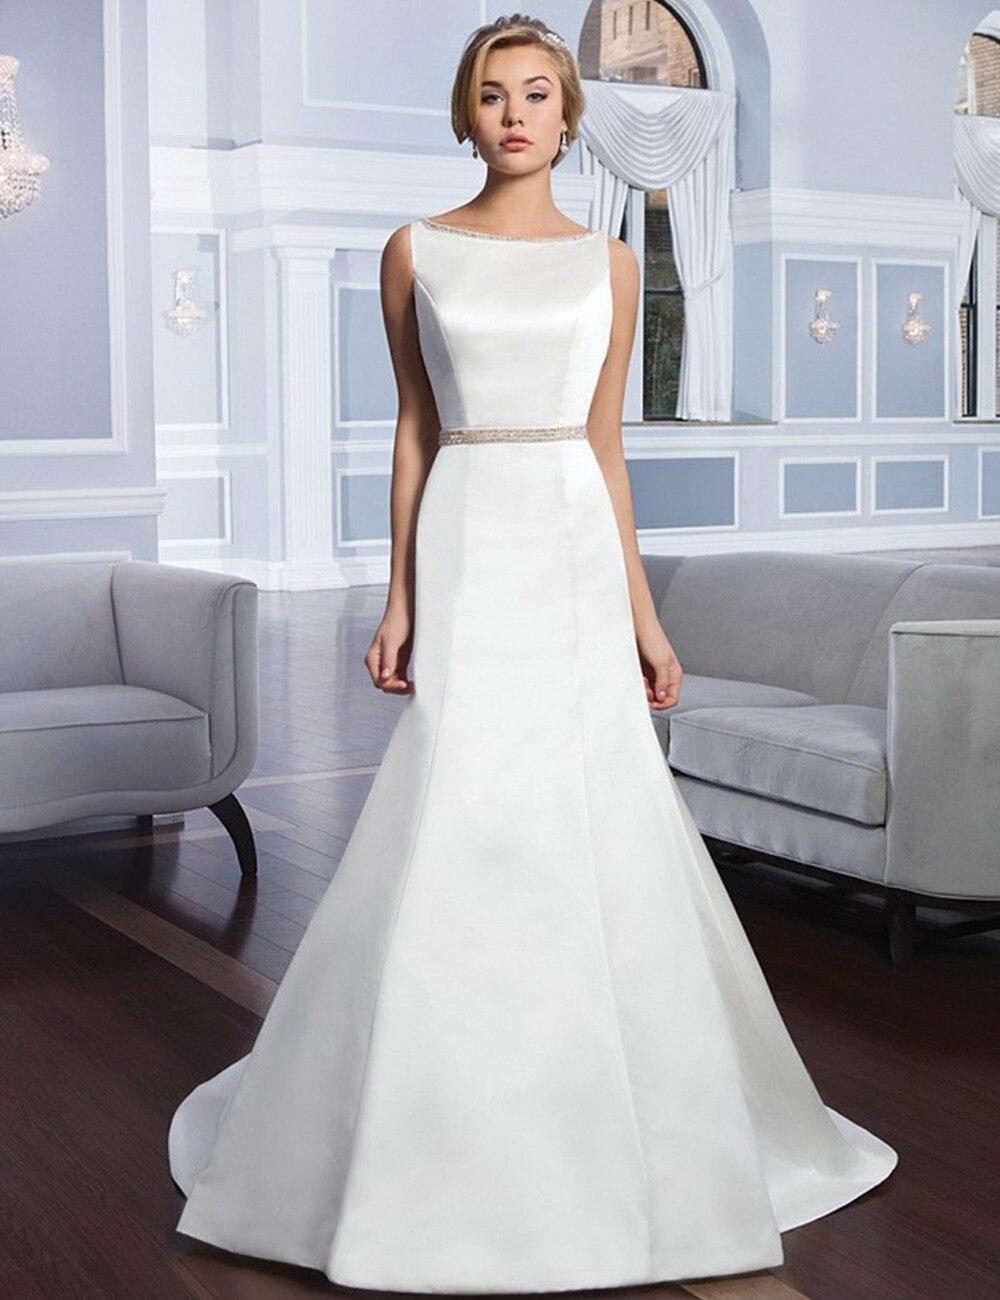 Online Get Cheap Simple Mermaid Wedding Dresses -Aliexpress.com ...